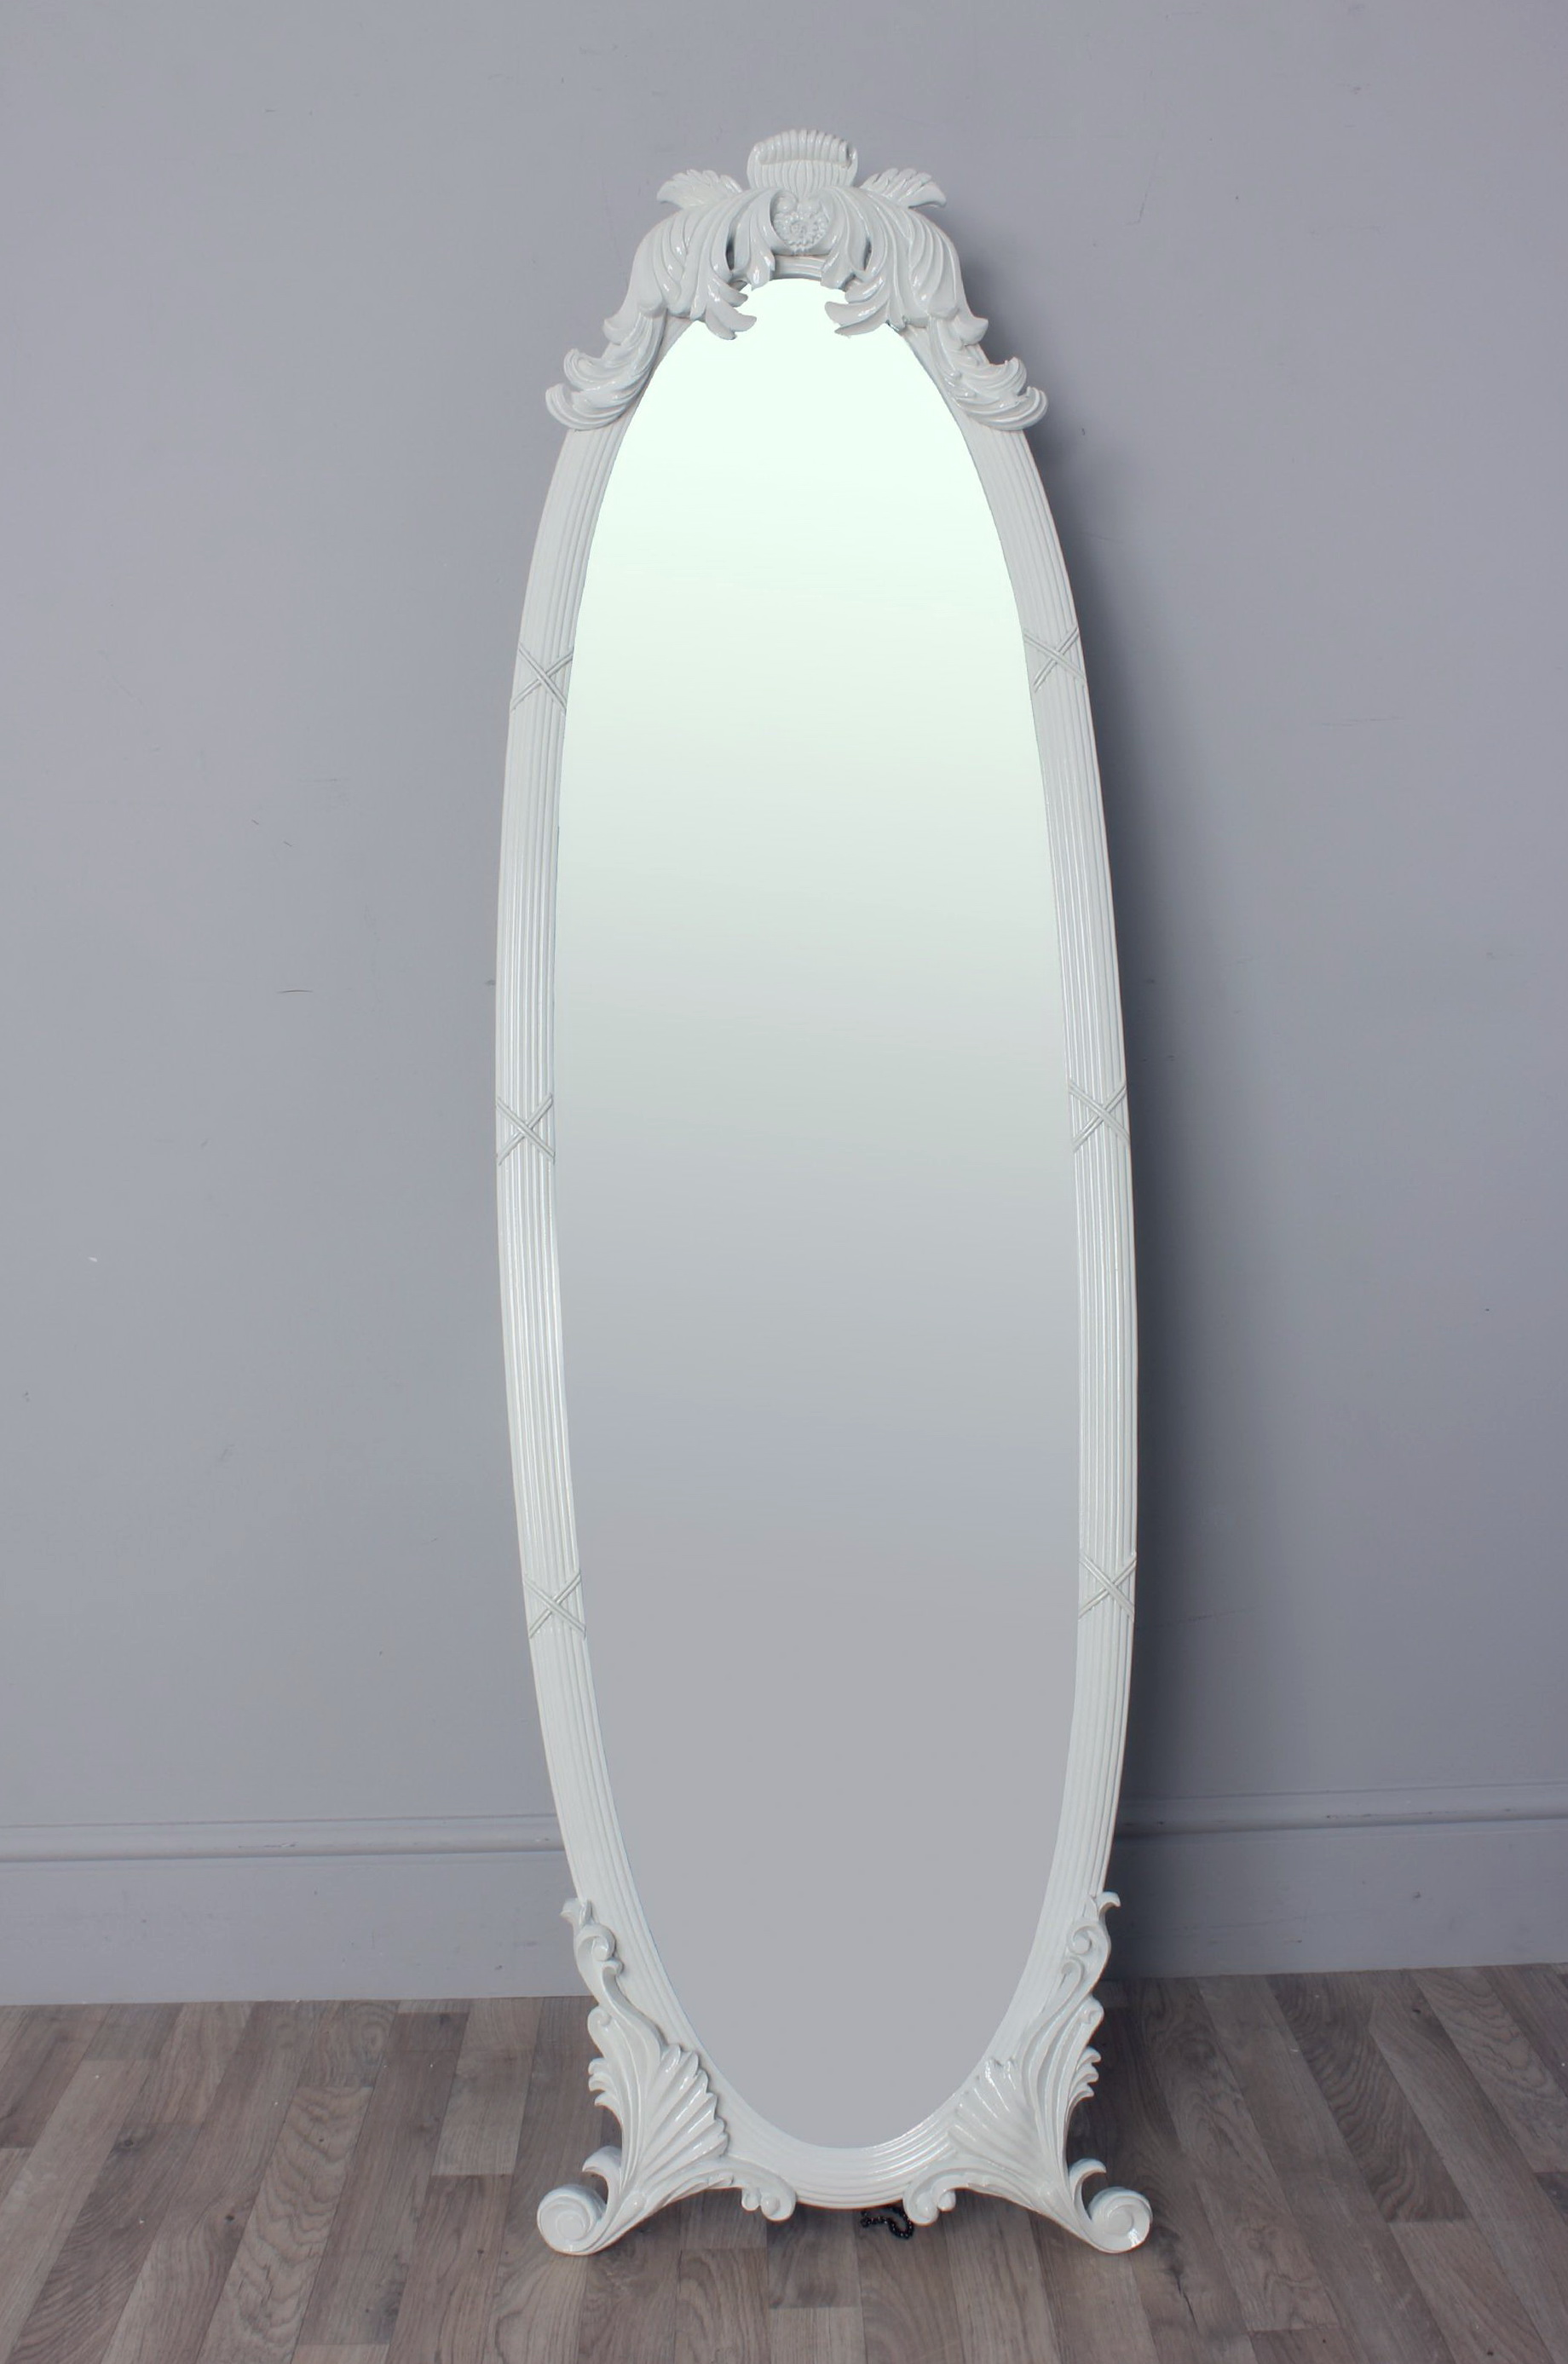 Vintage Full Length Mirrors